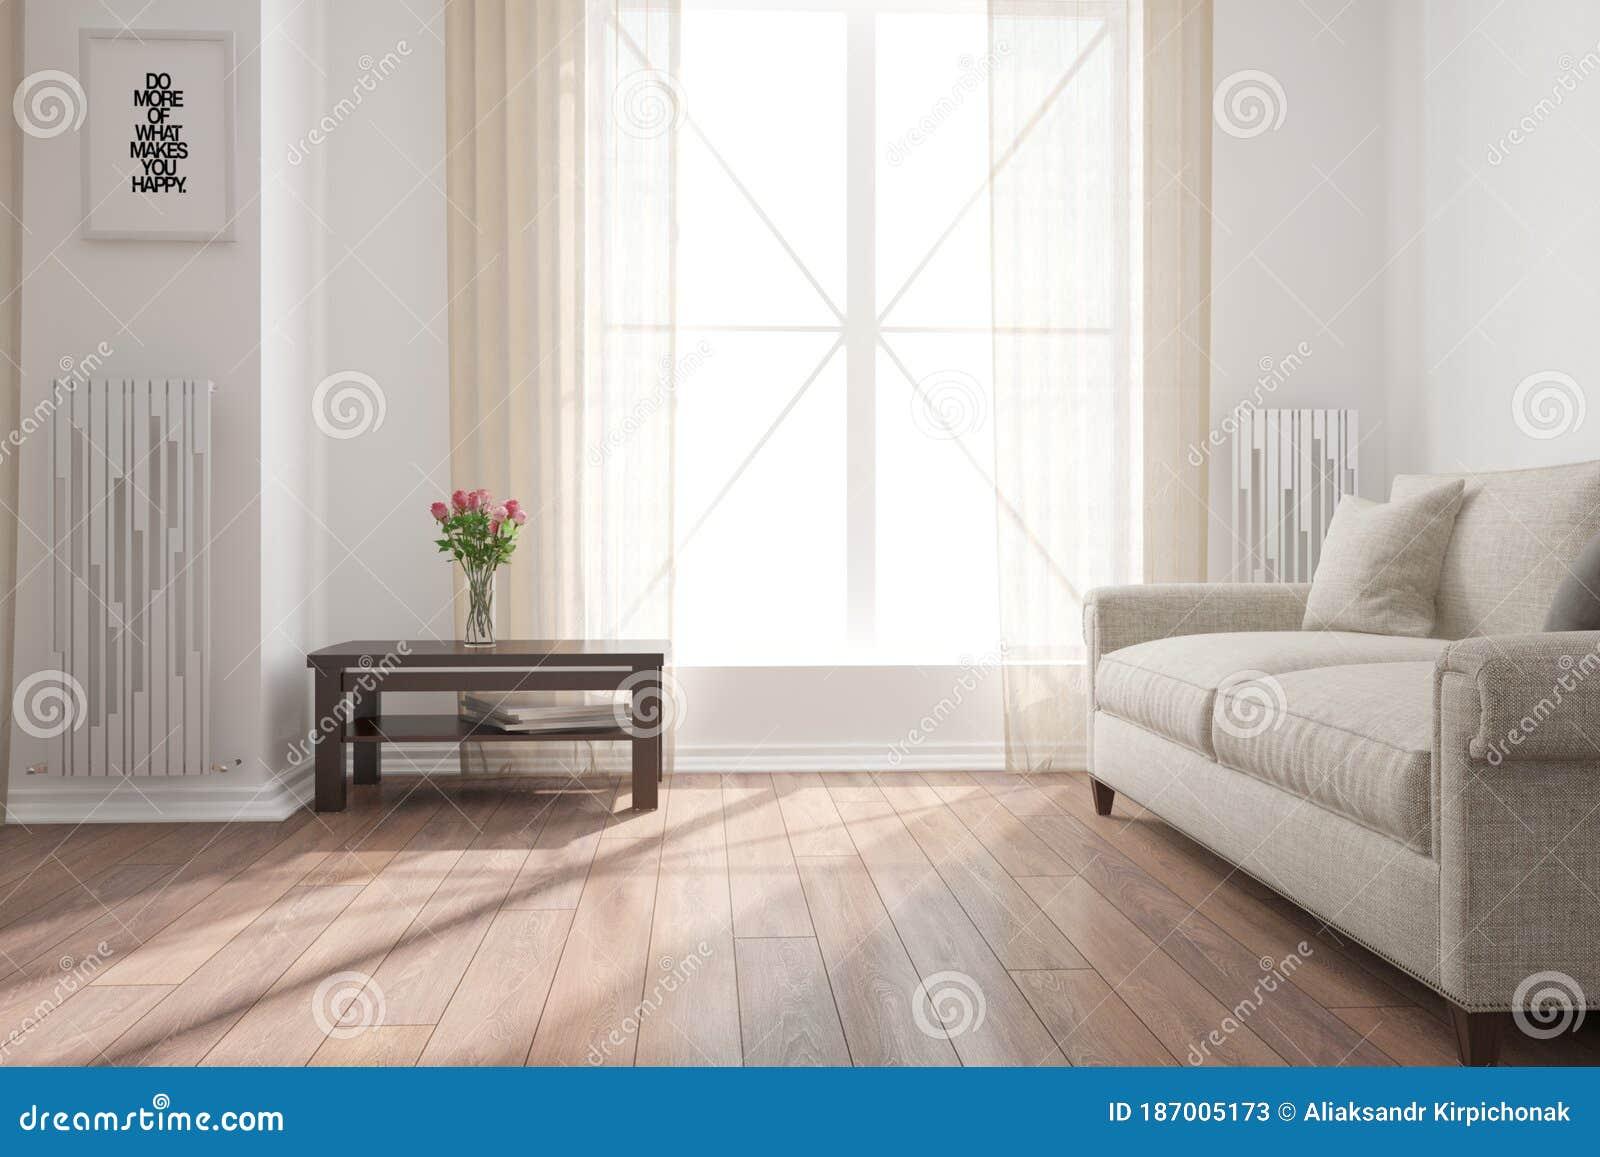 Modern Empty Room With Sofa Table Plant Interior Design 3d Illustration Stock Illustration Illustration Of Carpet Luxury 187005173